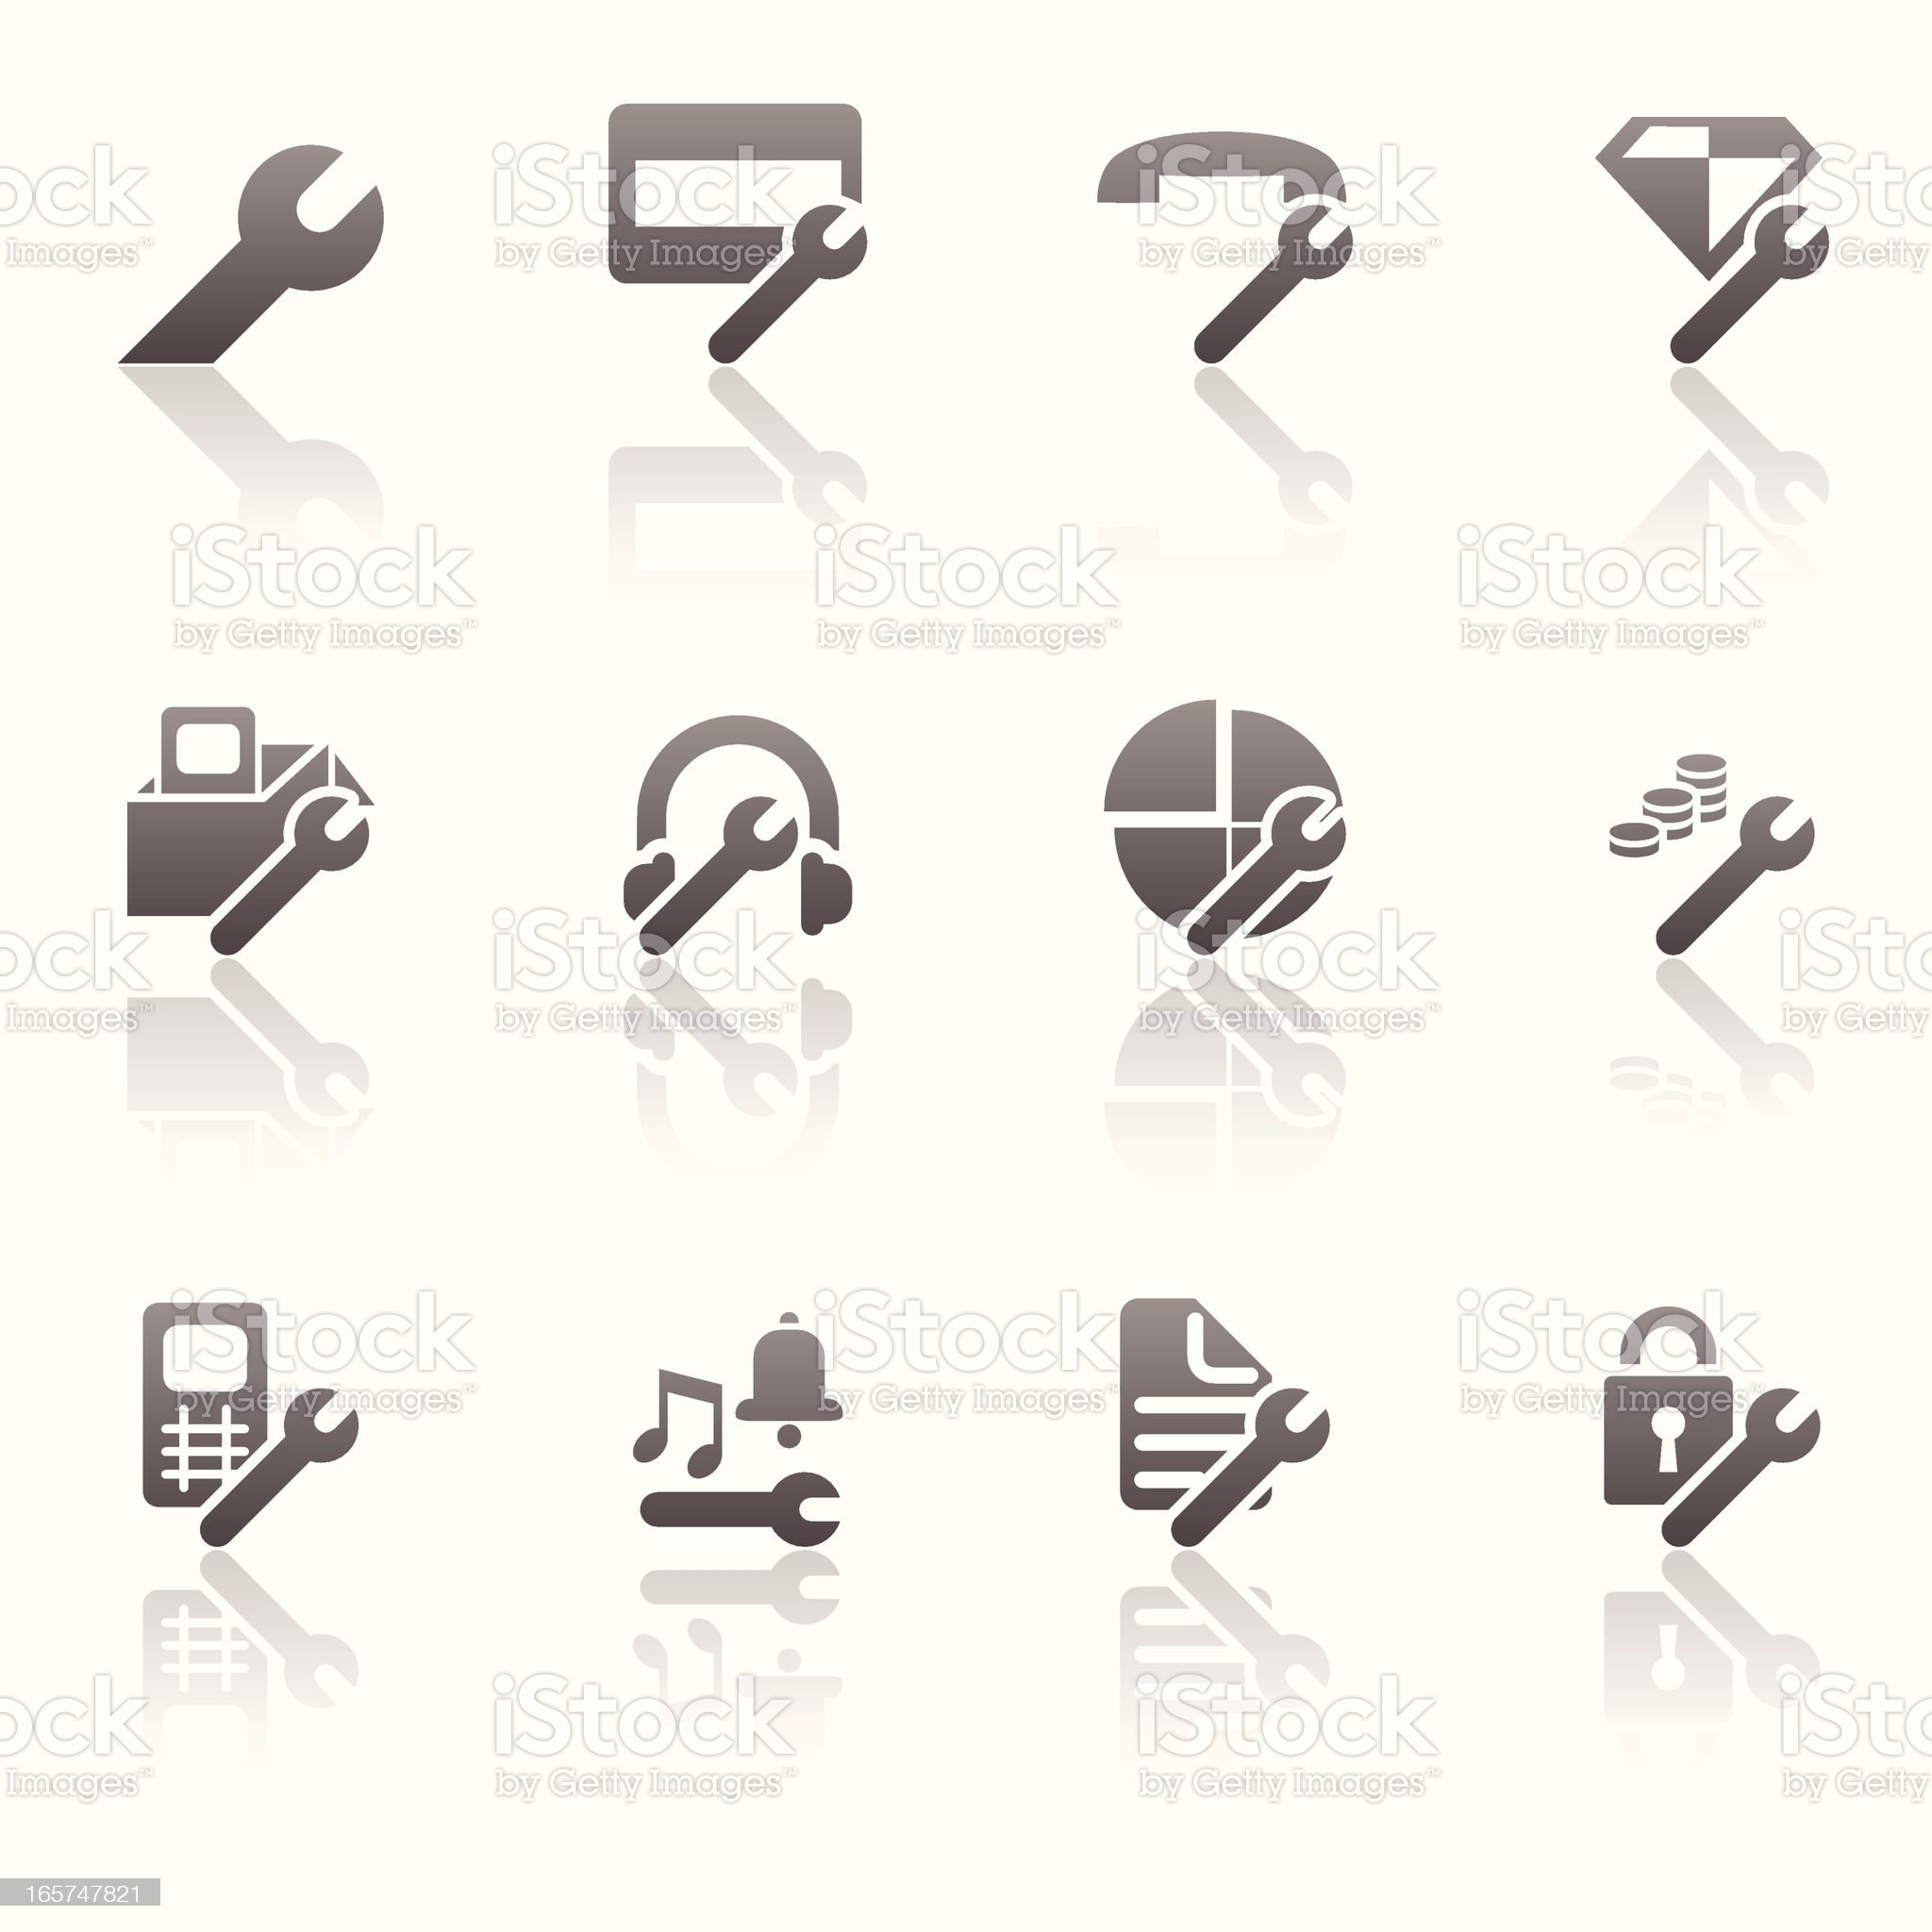 Settings Icon Set royalty-free stock vector art